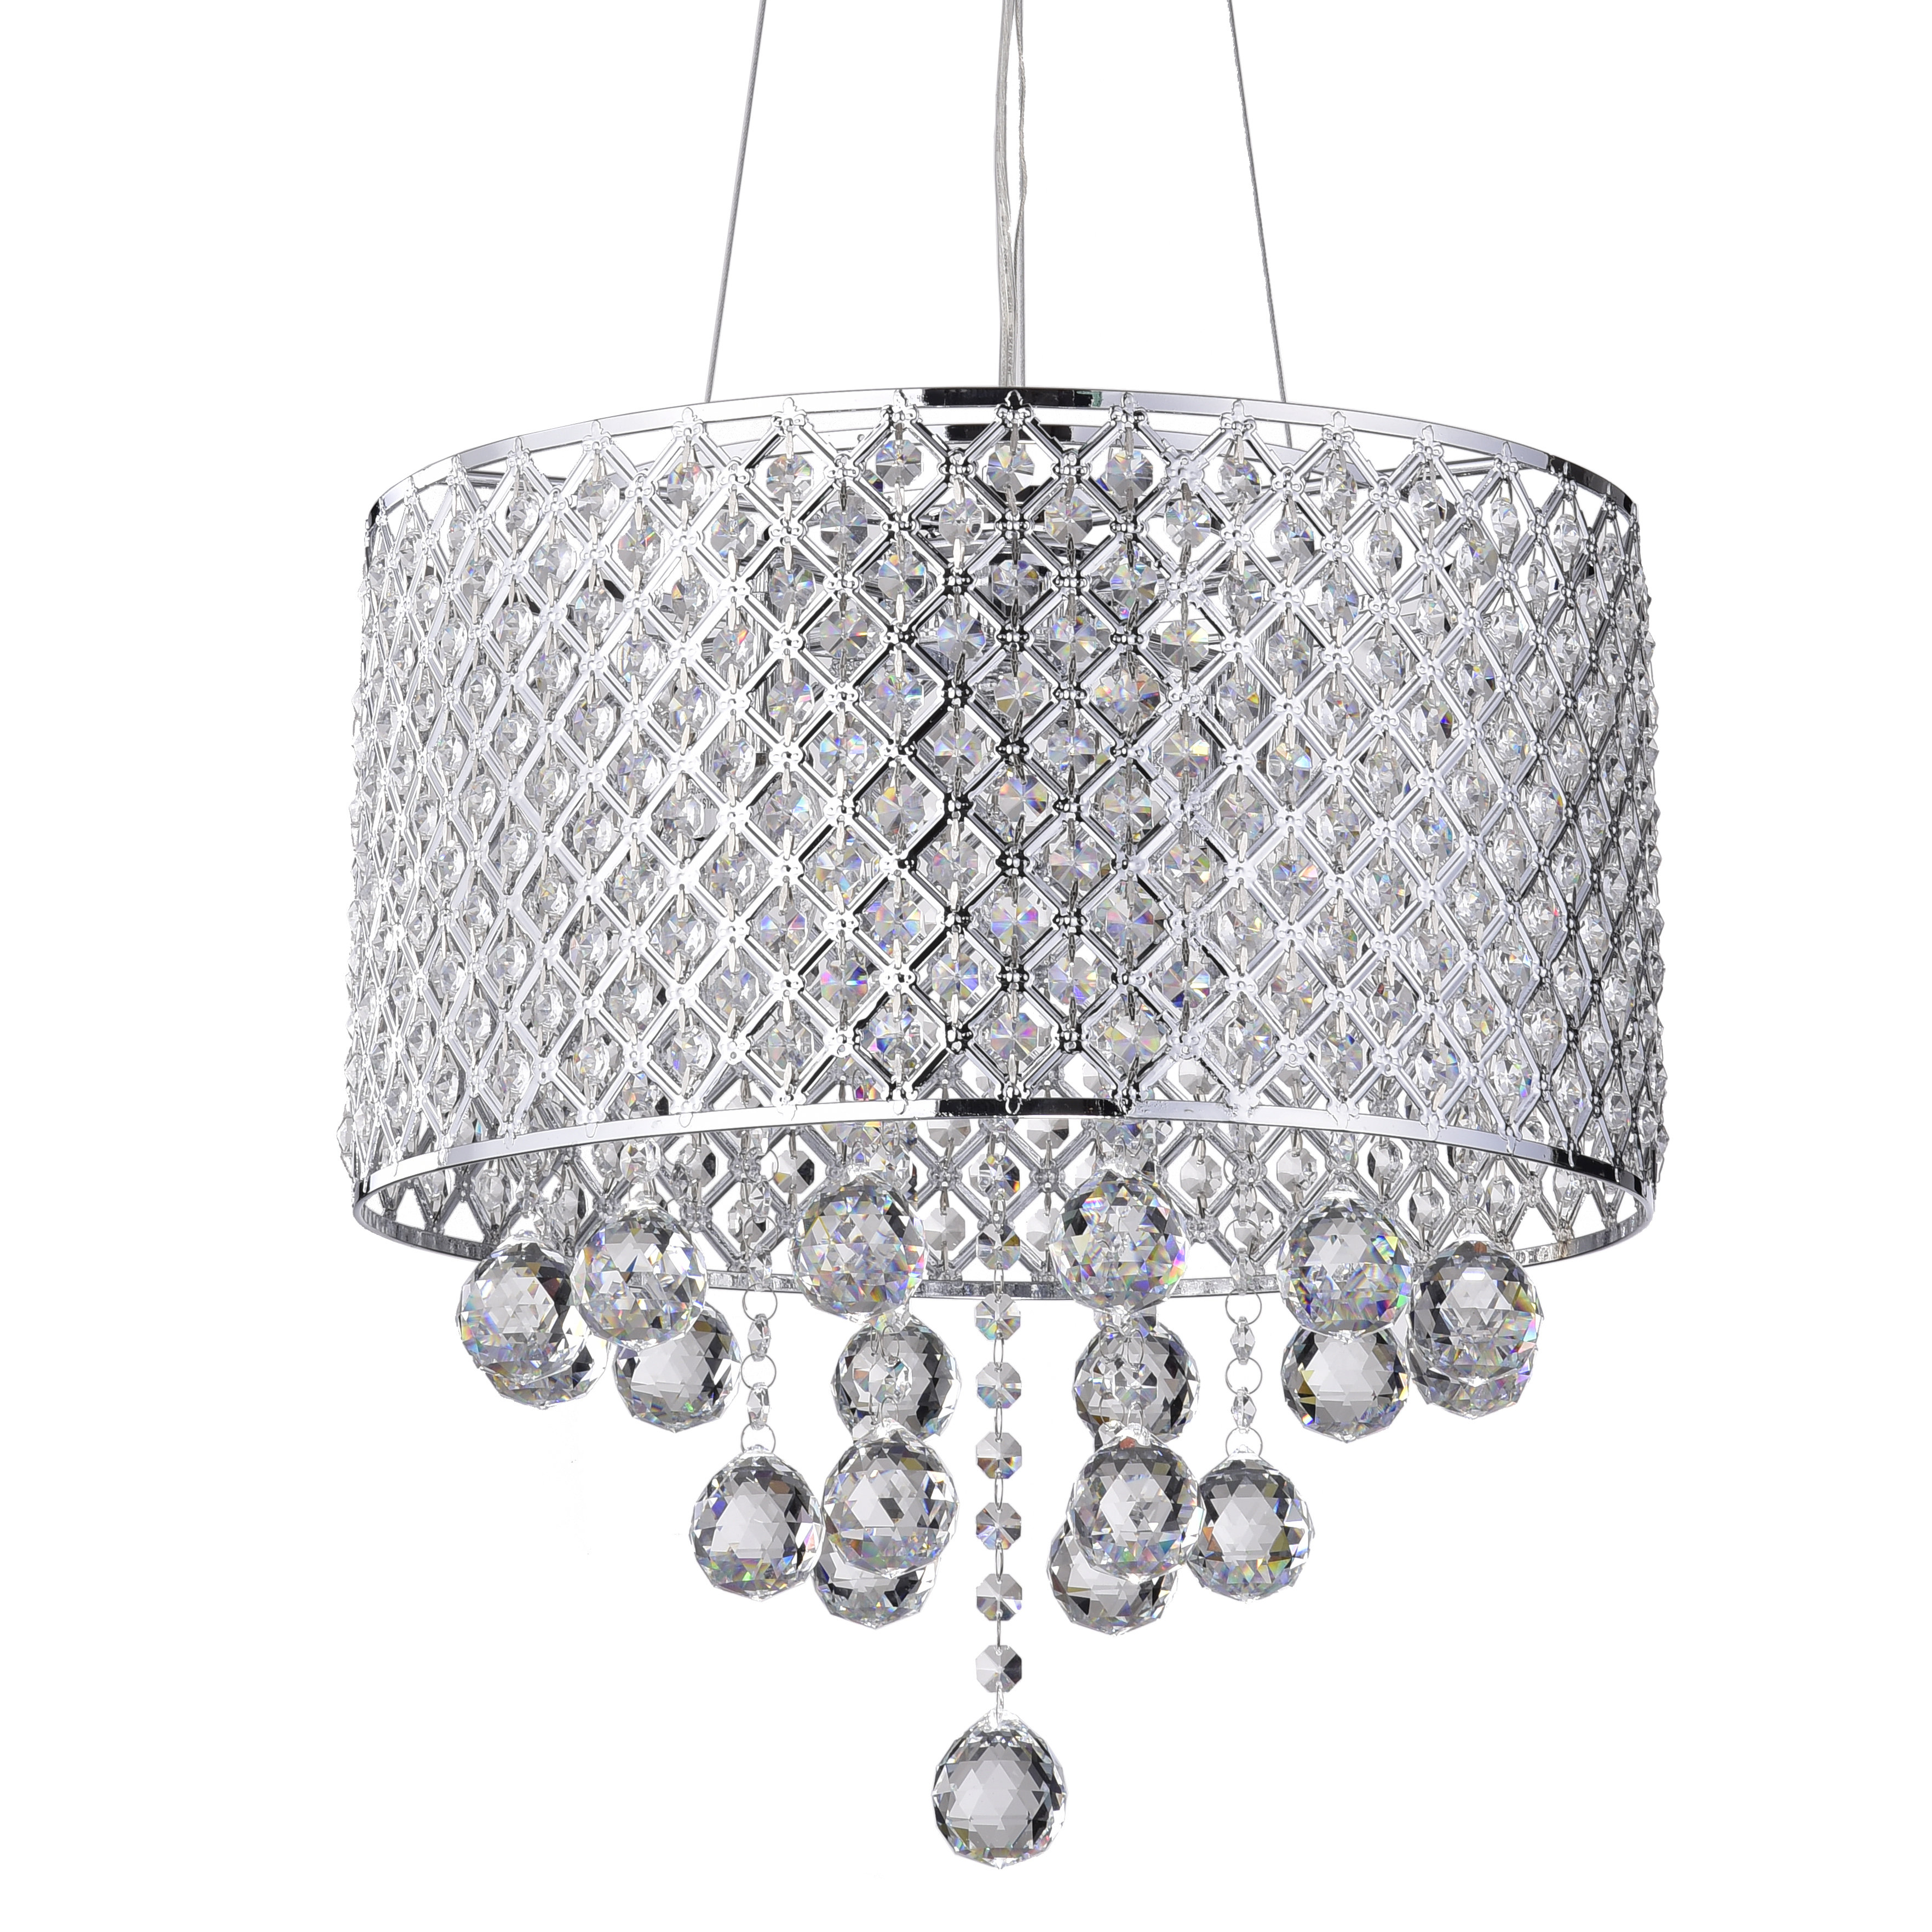 Ginnia 4 Light Crystal Chandelier In Aurore 4 Light Crystal Chandeliers (View 8 of 30)